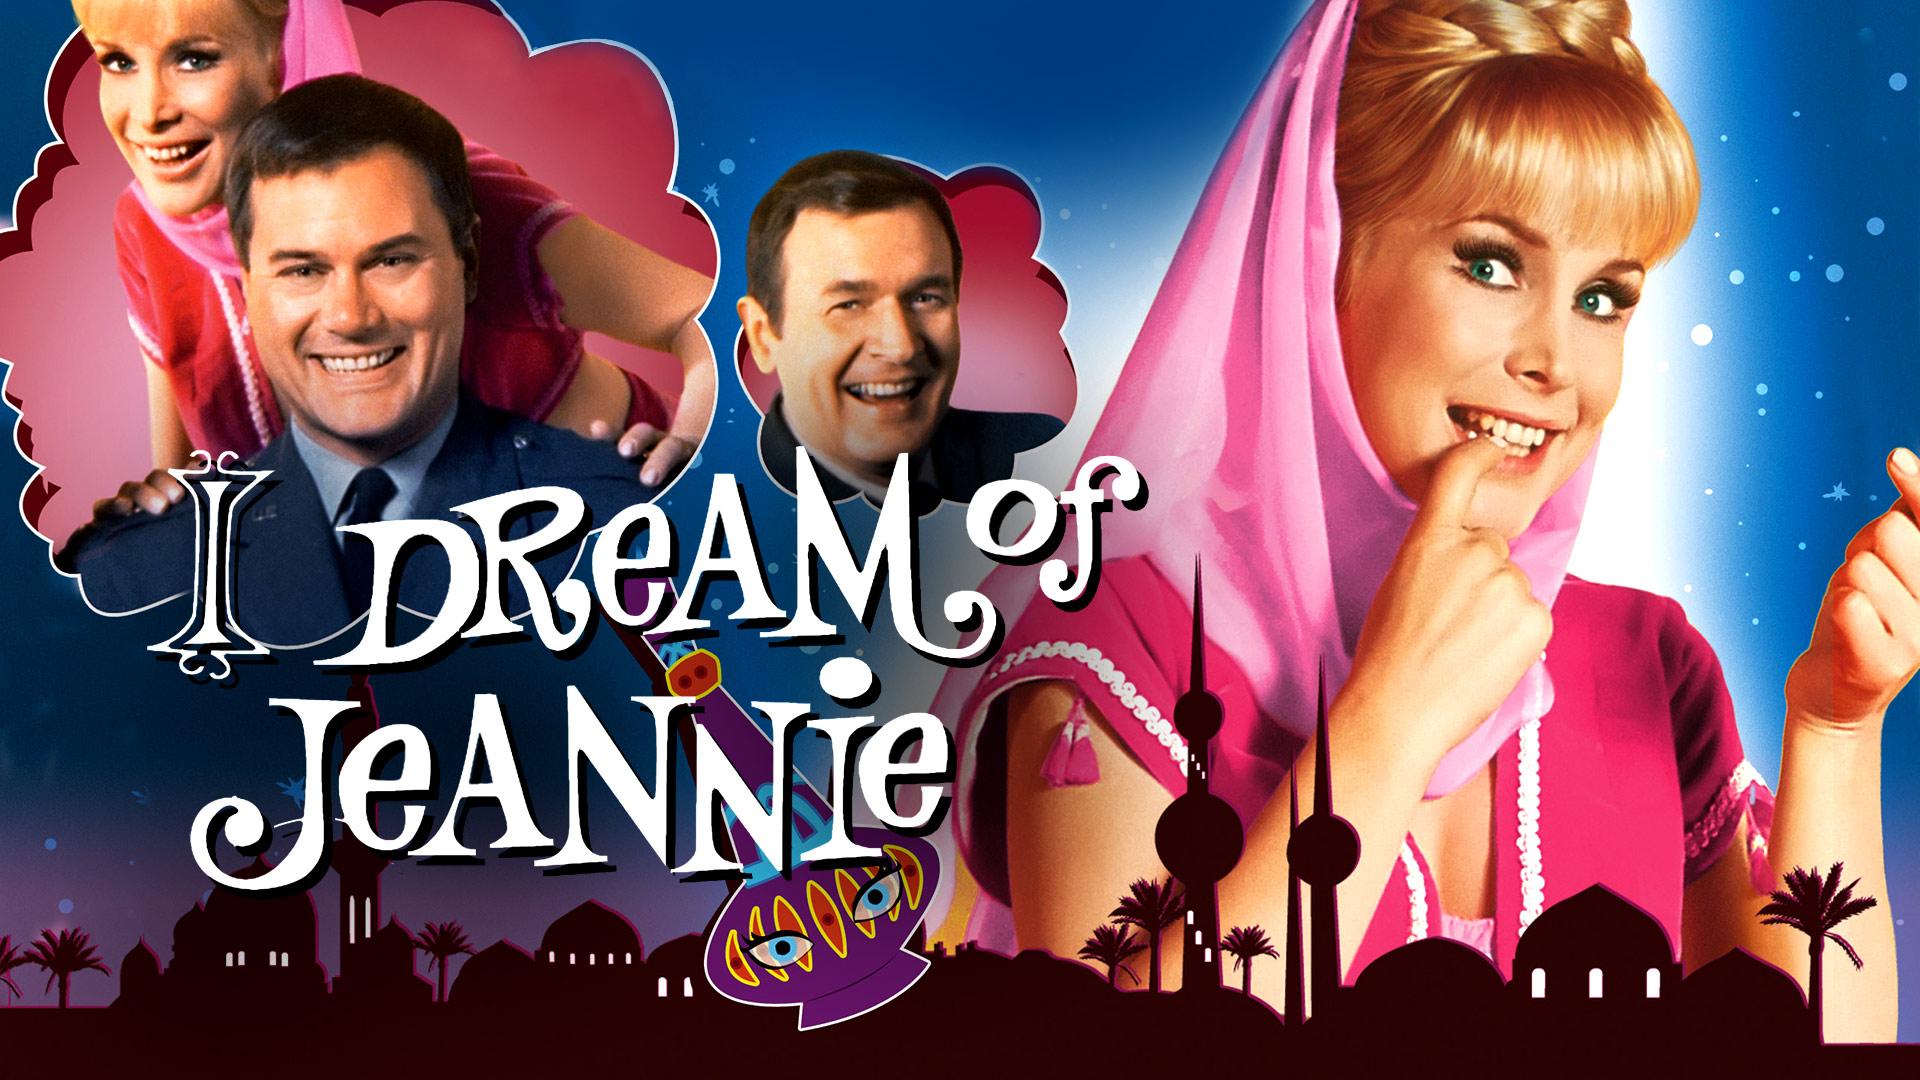 I Dream of Jeannie Season 1